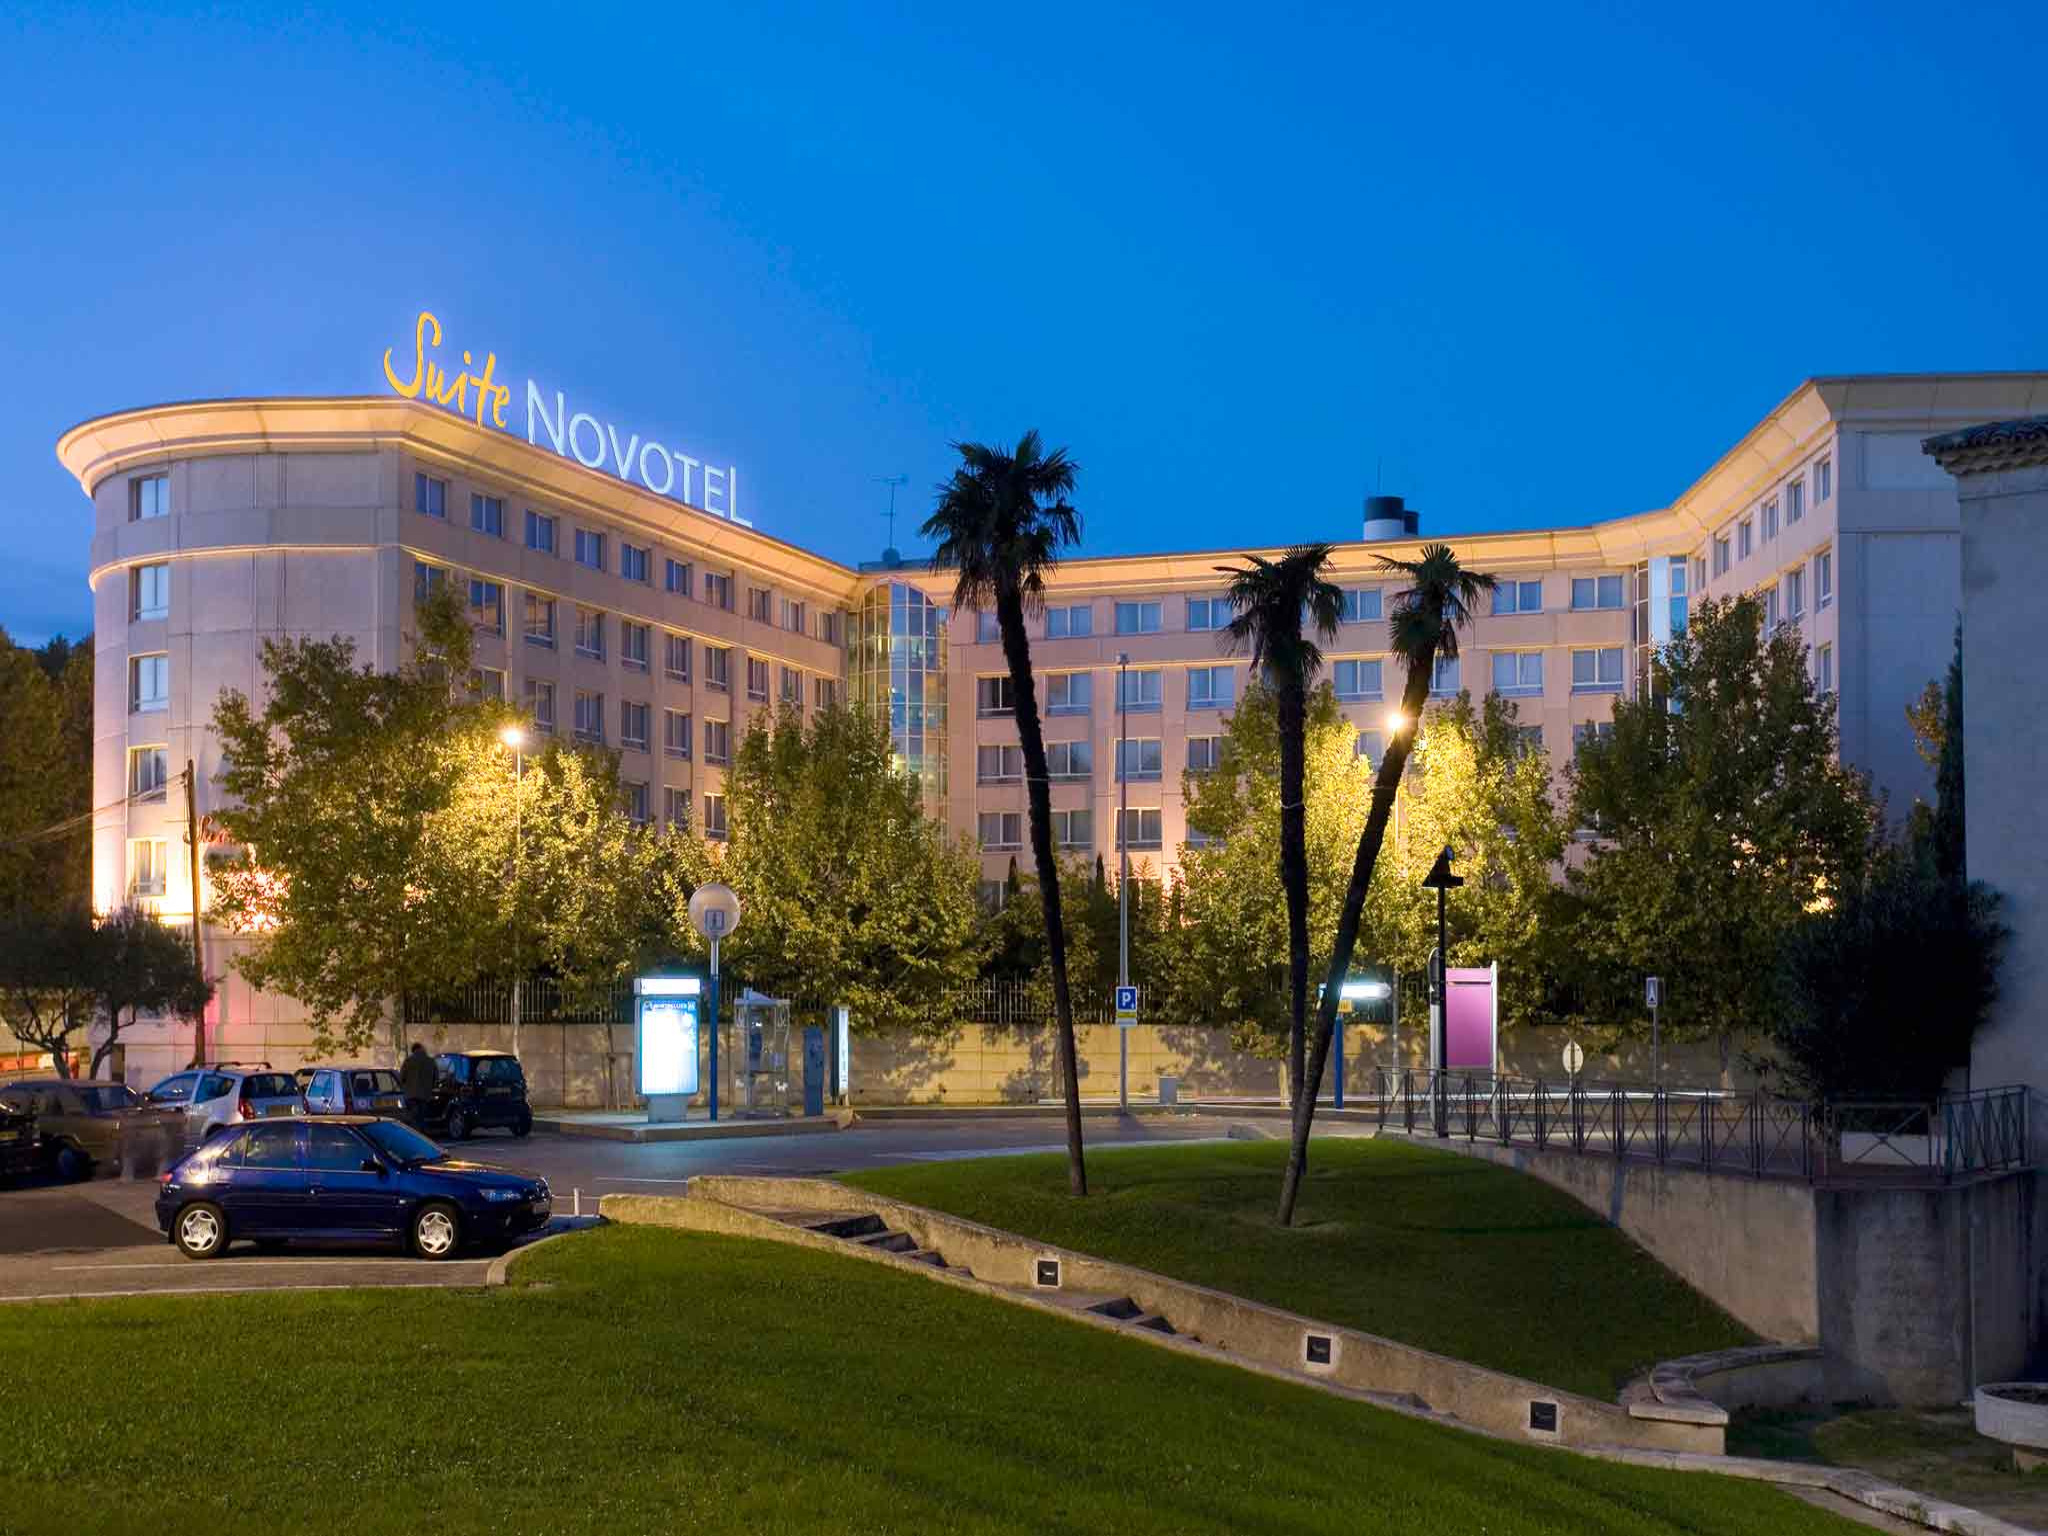 Hotell – Novotel Suites Montpellier